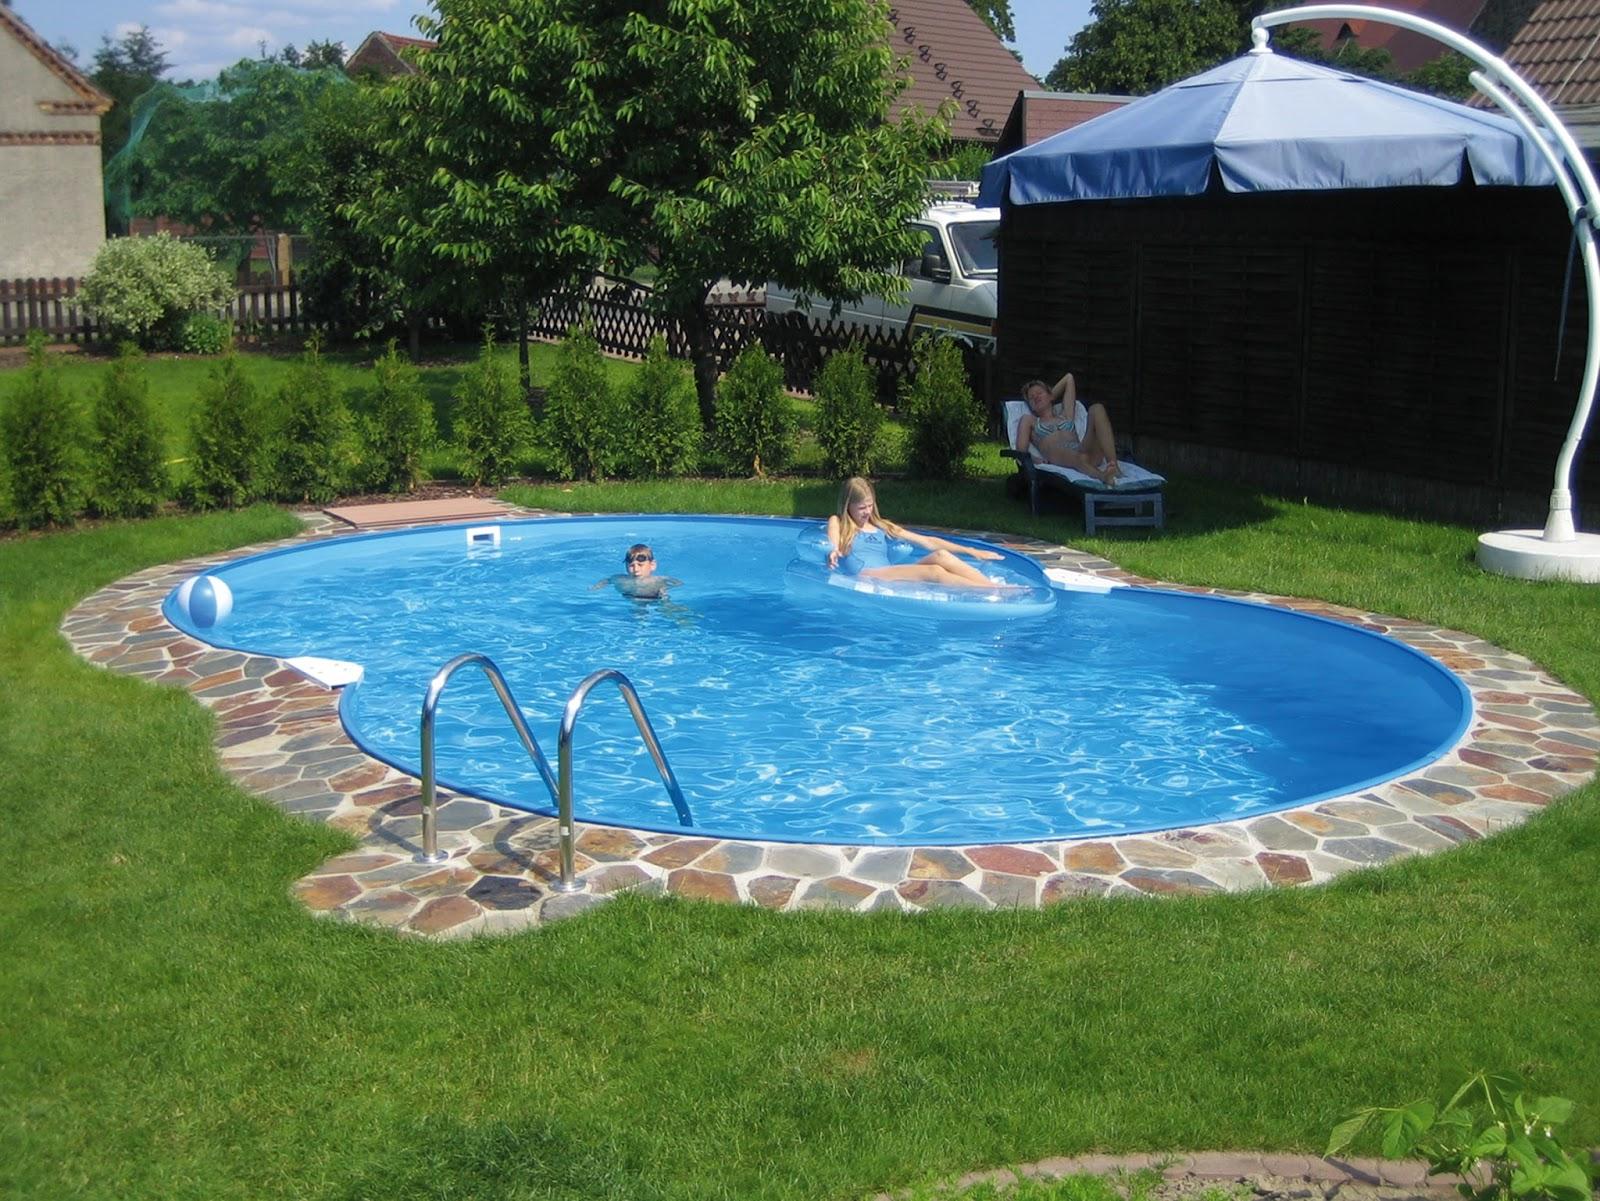 How To Draw A Swimming Pool - minimalist interior design